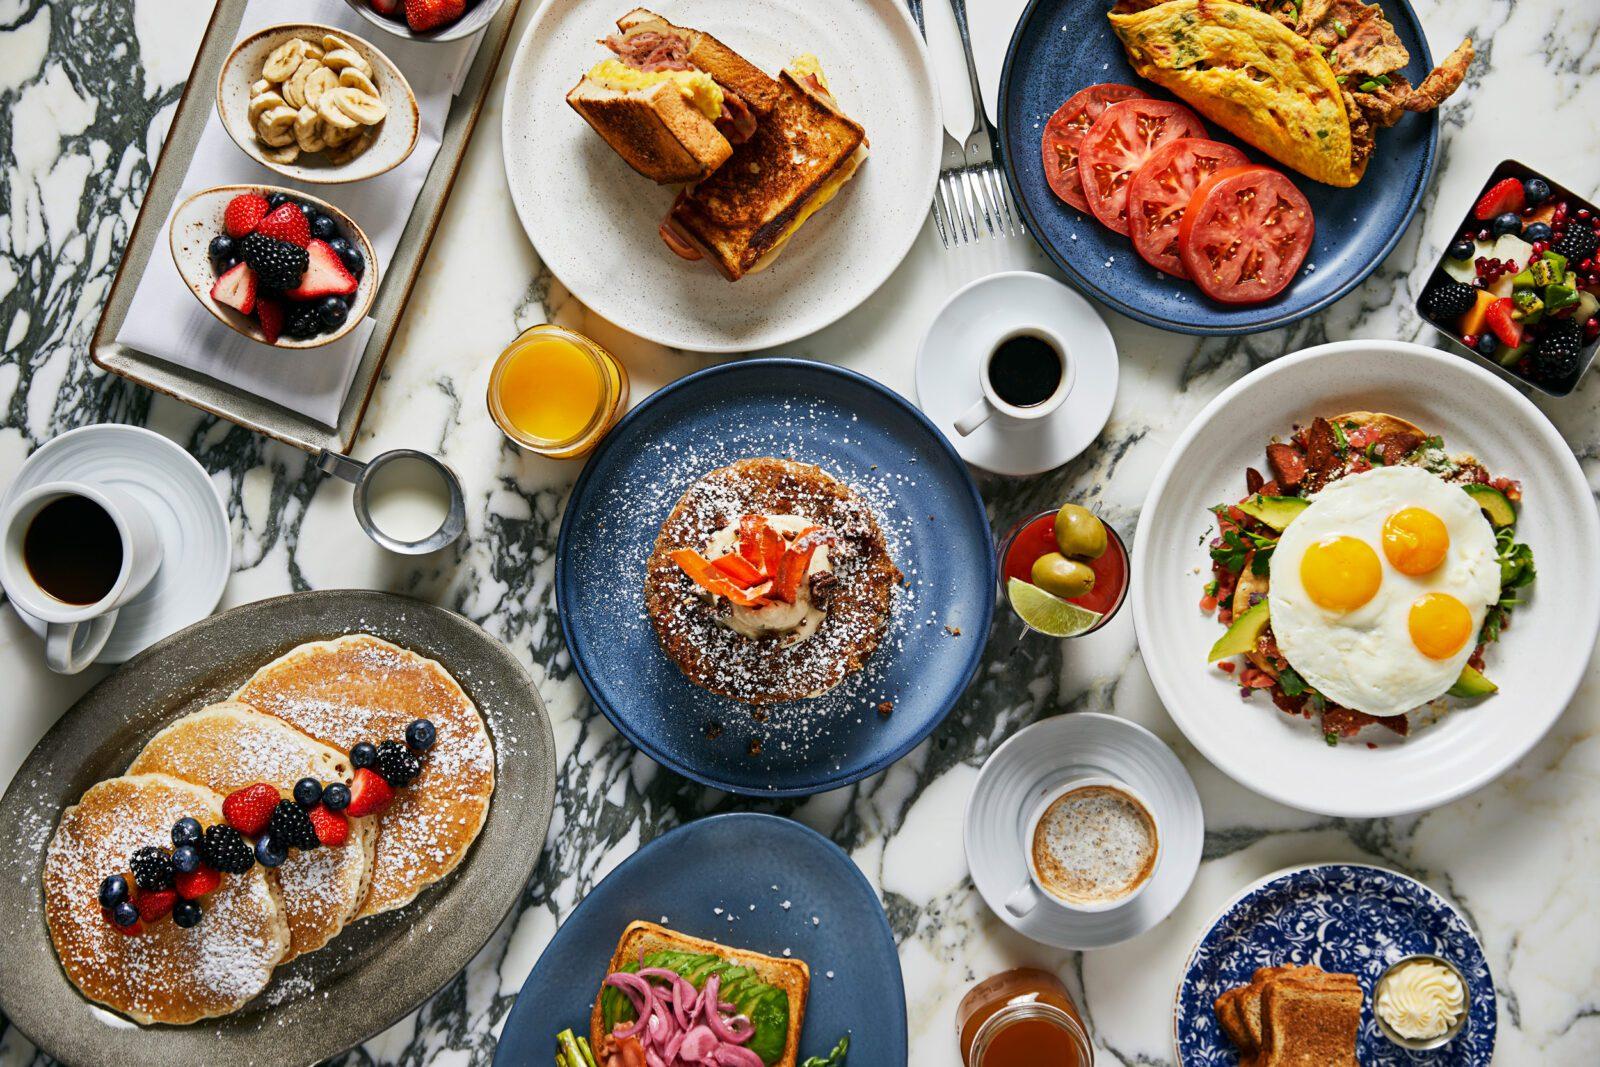 Cafe Americano Breakfast Group 1600x1067 1